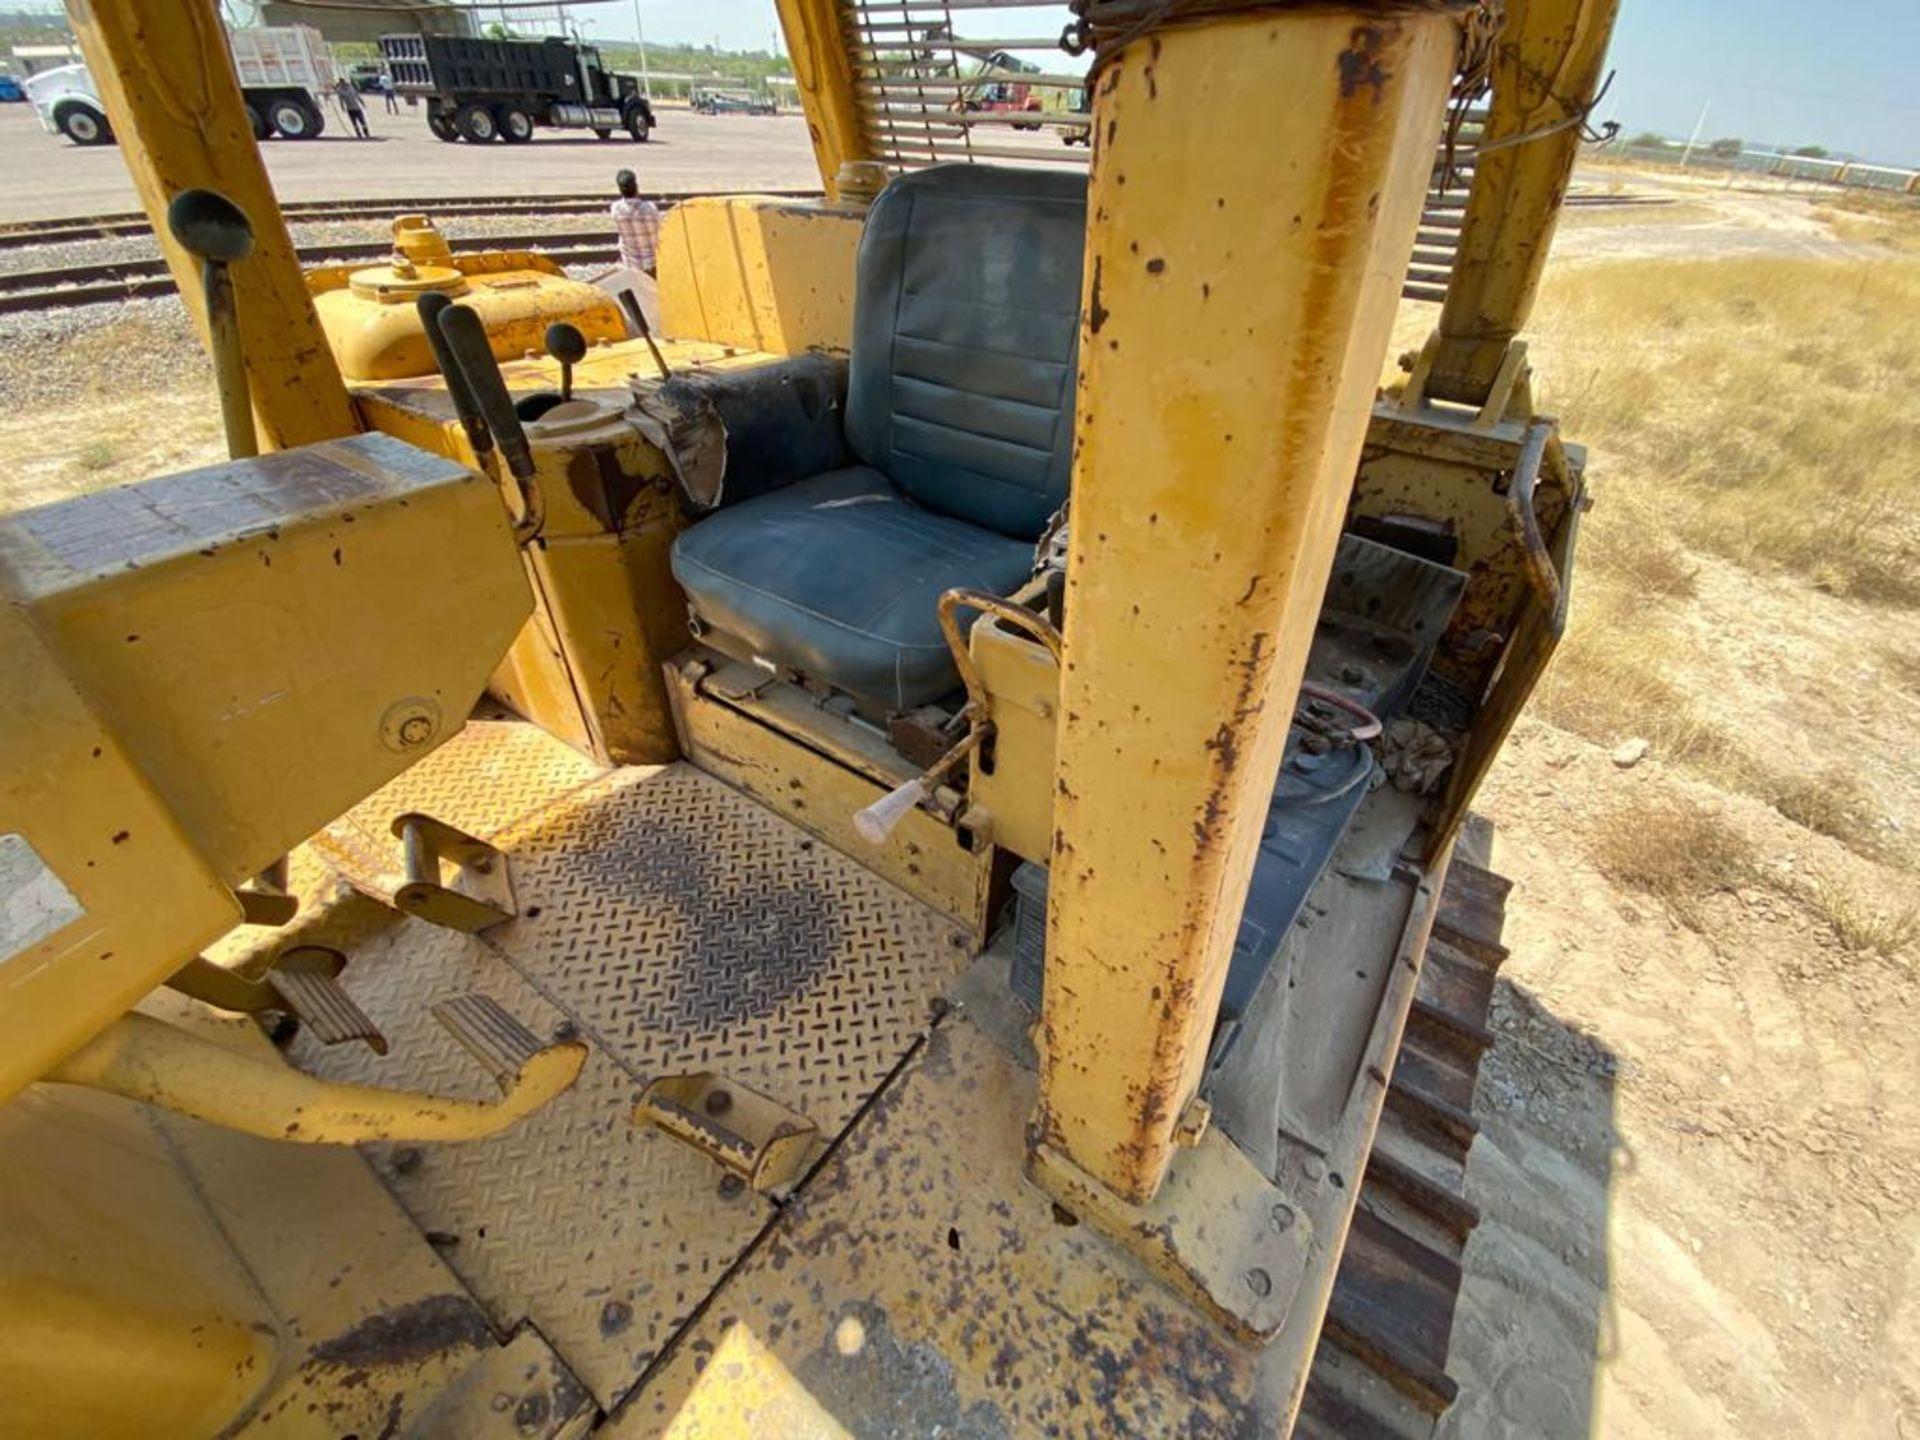 Caterpillar D7G Bulldozer, Serial number 92V5897, Diesel motor - Image 34 of 48